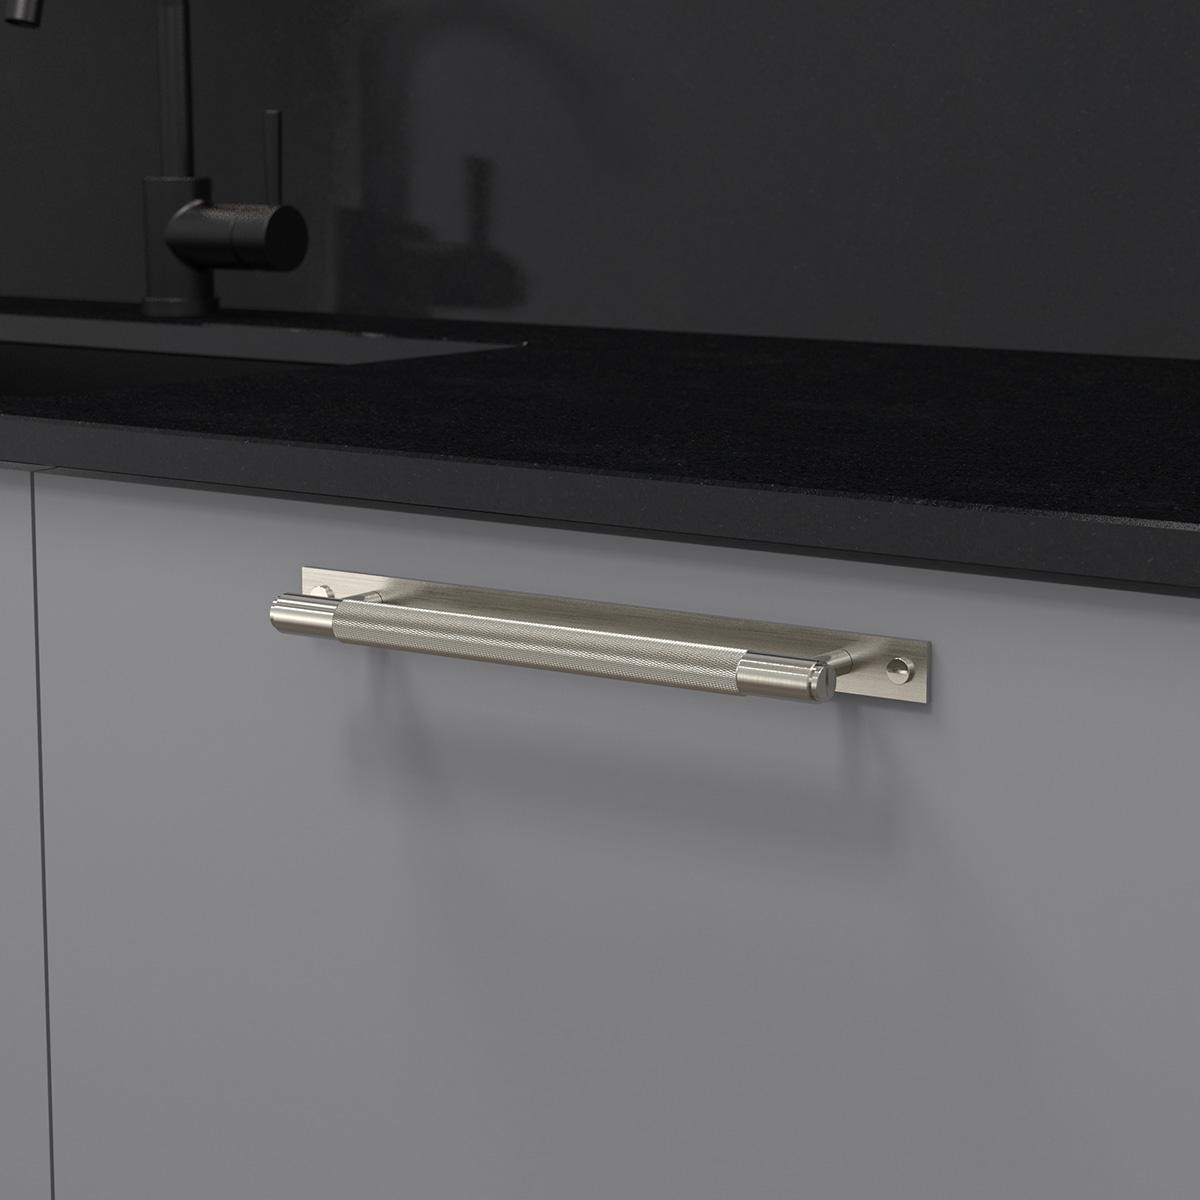 pull bar plate stål uk pb hp 260 st a cc 225 mm ncs s 4500 n granit svart